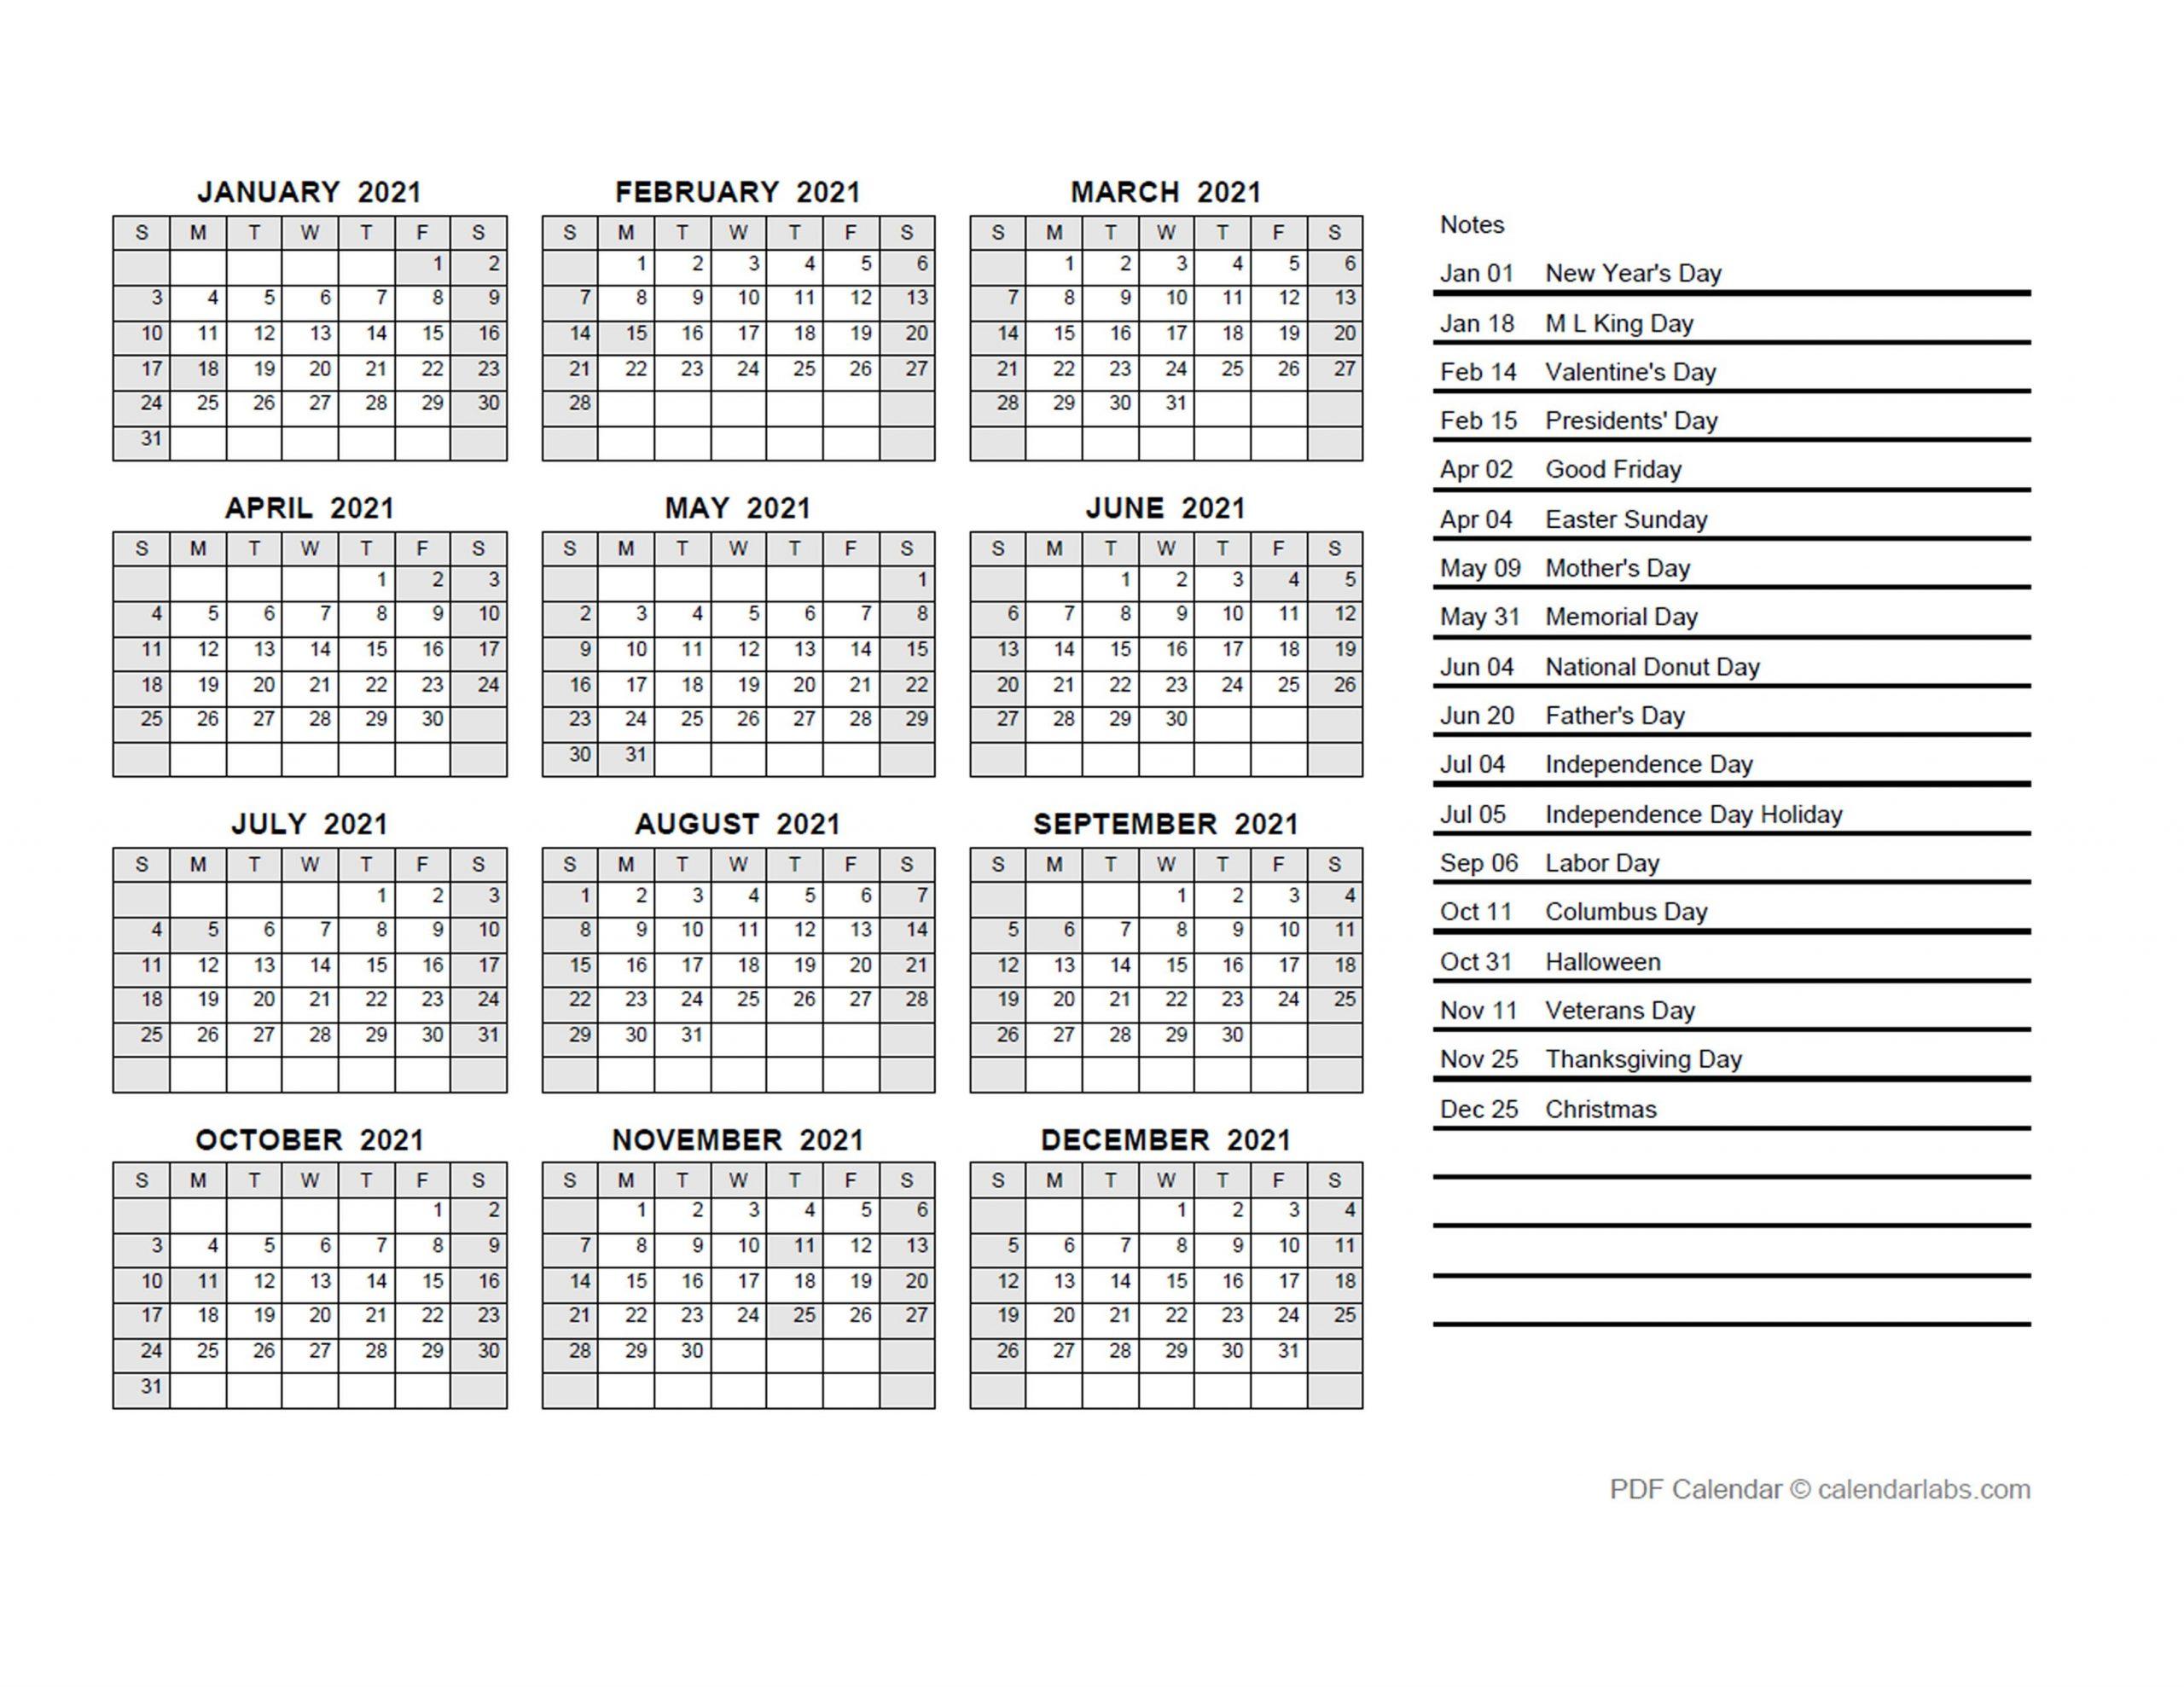 2021 Yearly Calendar Pdf - Free Printable Templates with regard to Julian Date Calendar 2021 Pdf Photo